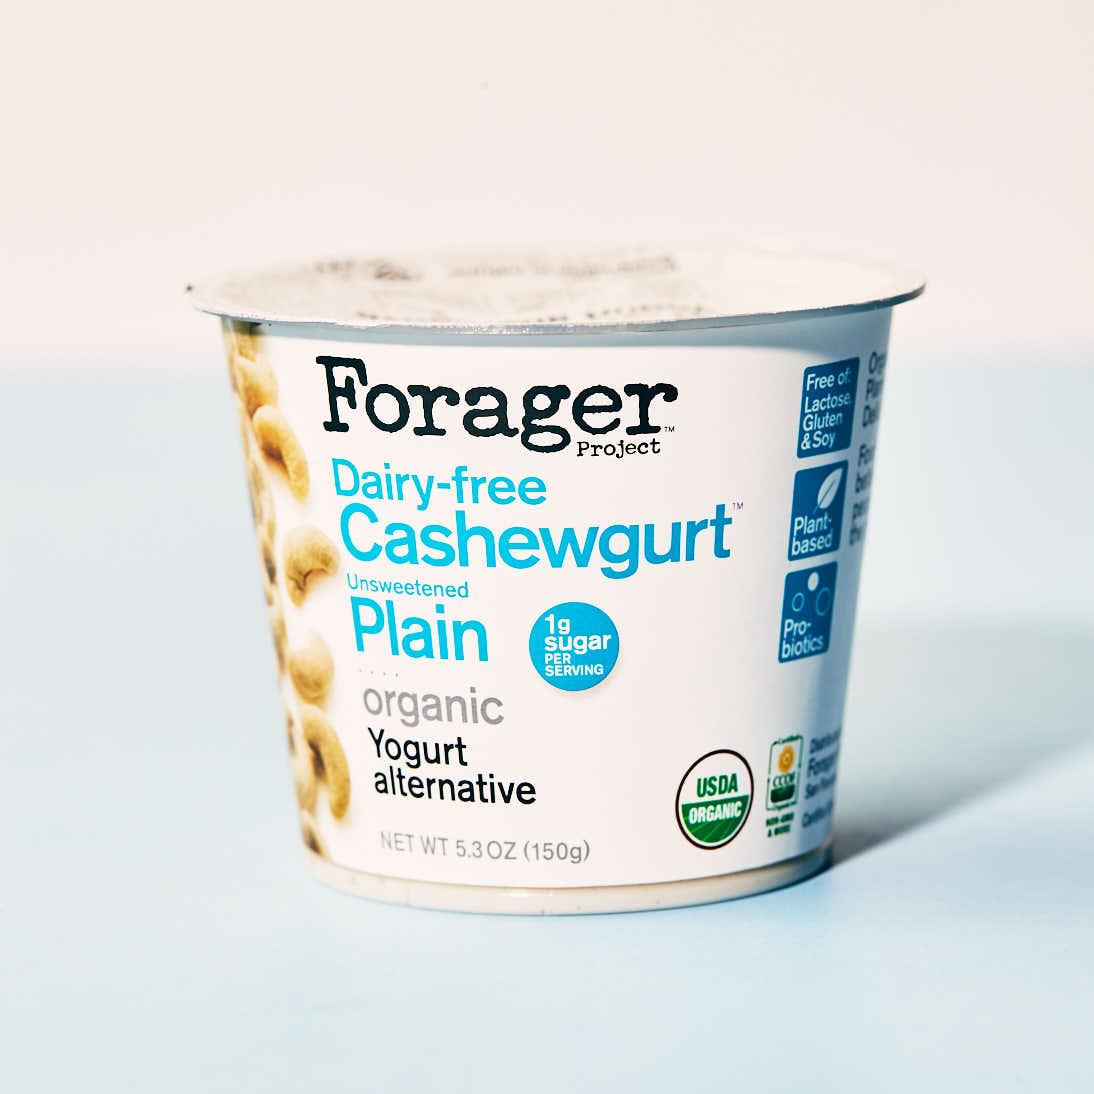 Forager Cashewgurt - Plain.jpg